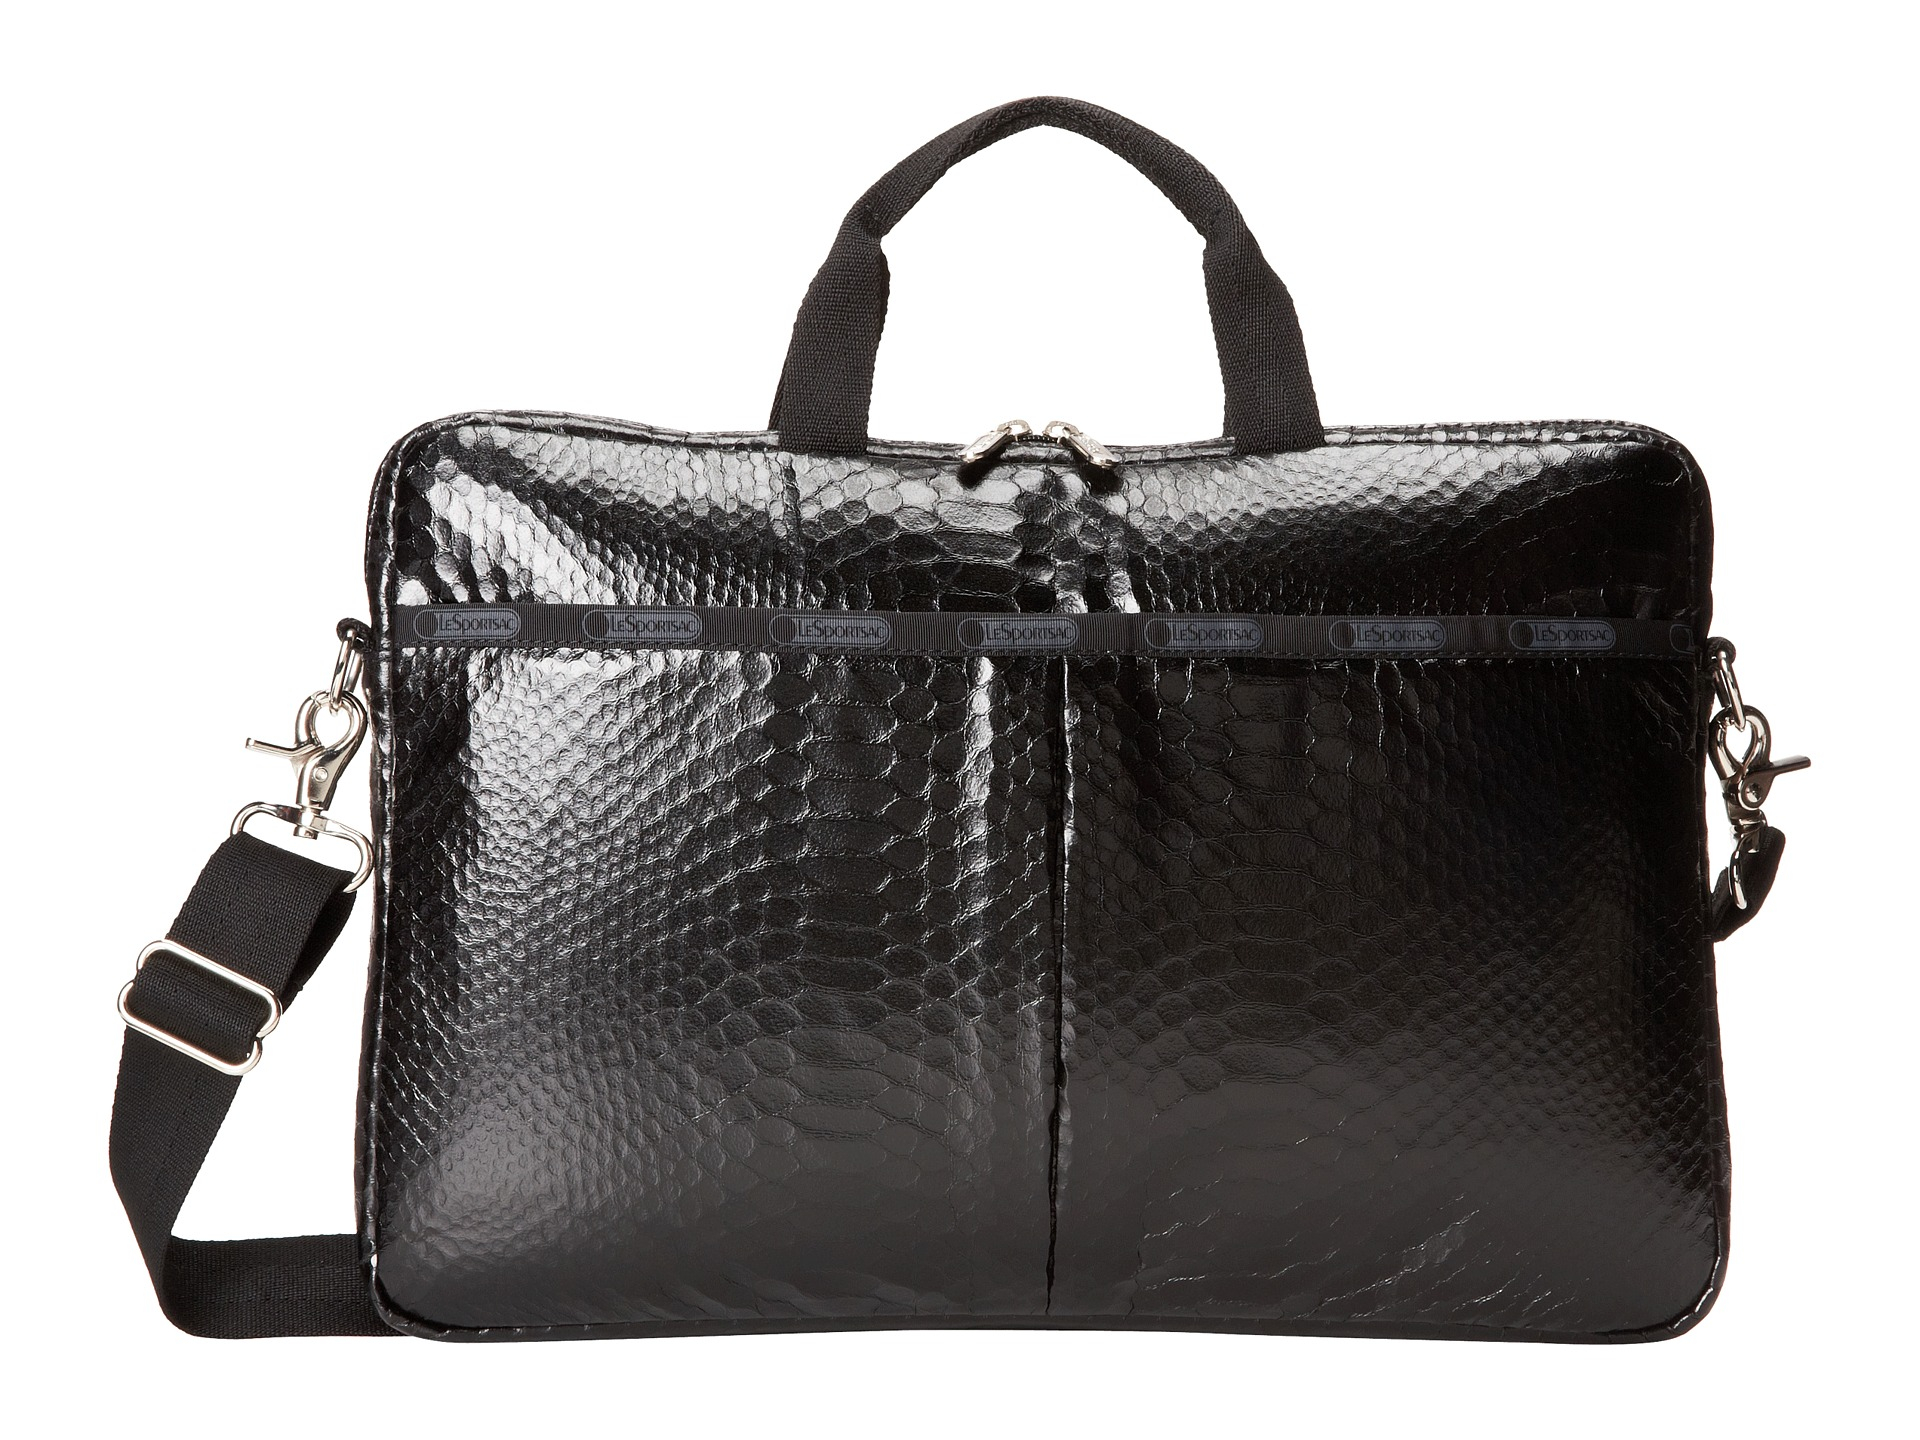 lesportsac 15 inch laptop bag in black leatherette snake